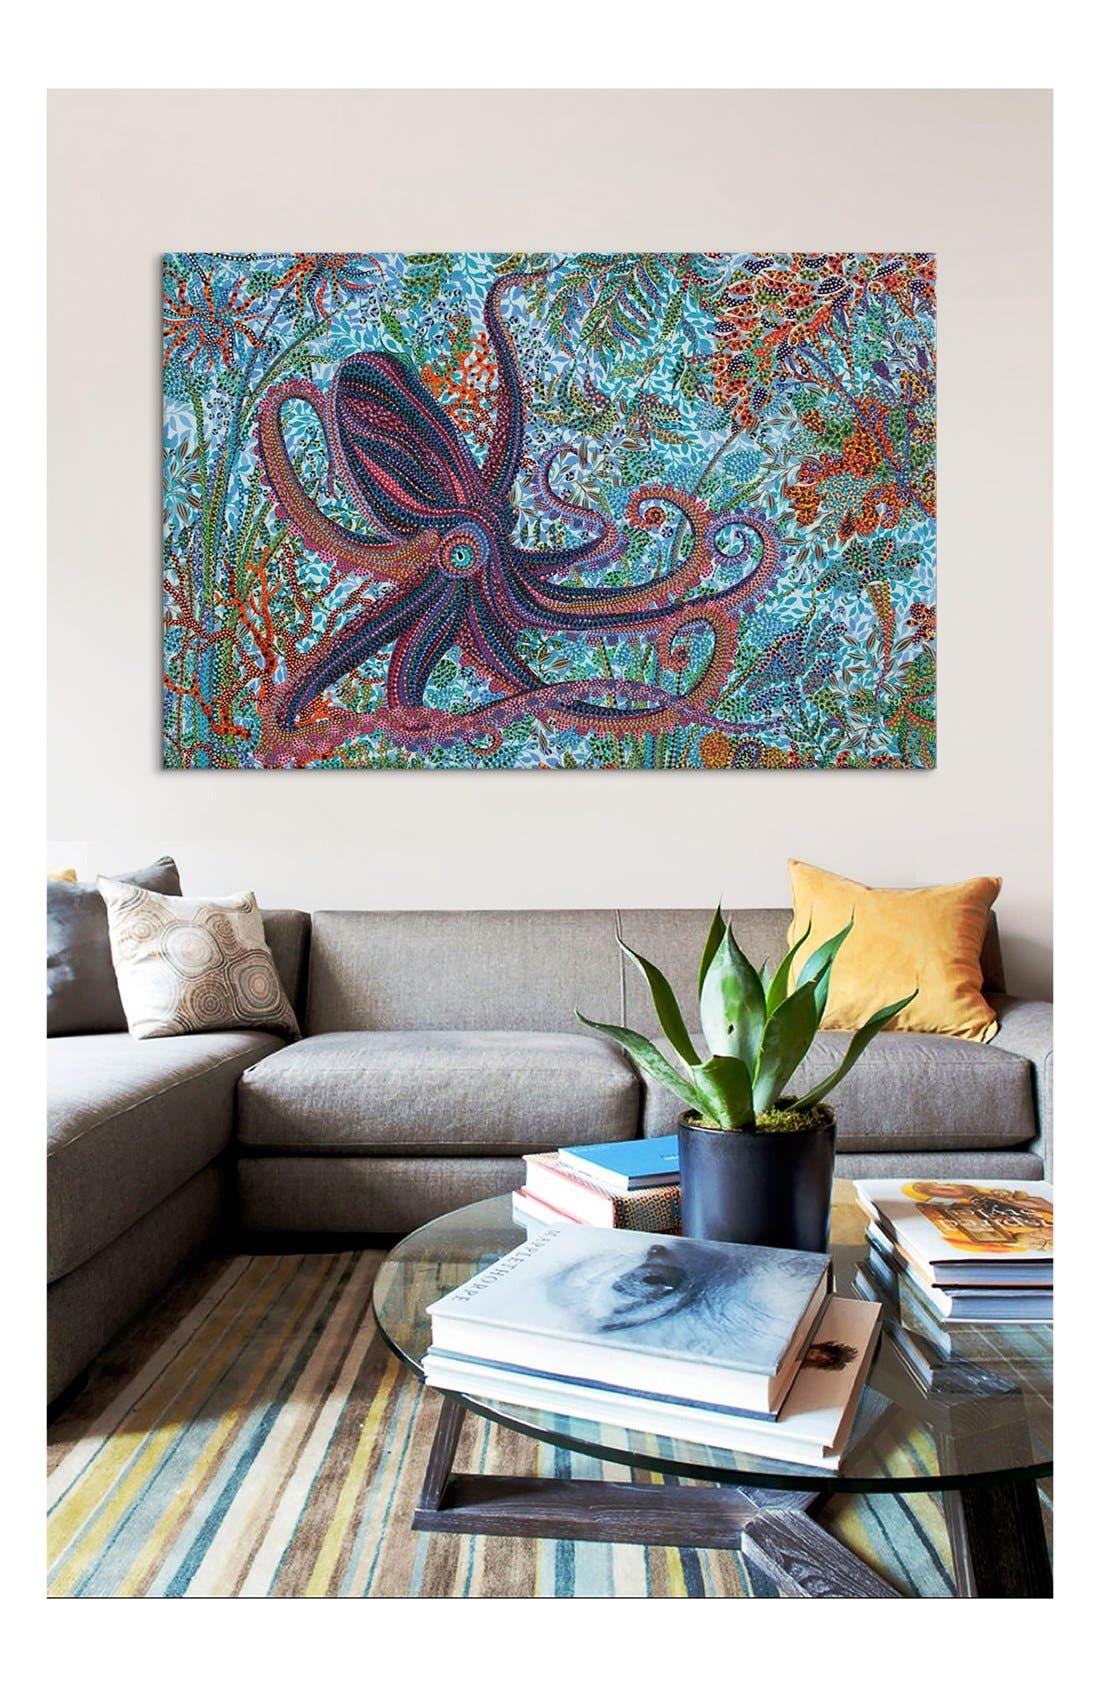 'Octopus - Ebova' Giclée Print Canvas Art,                             Alternate thumbnail 2, color,